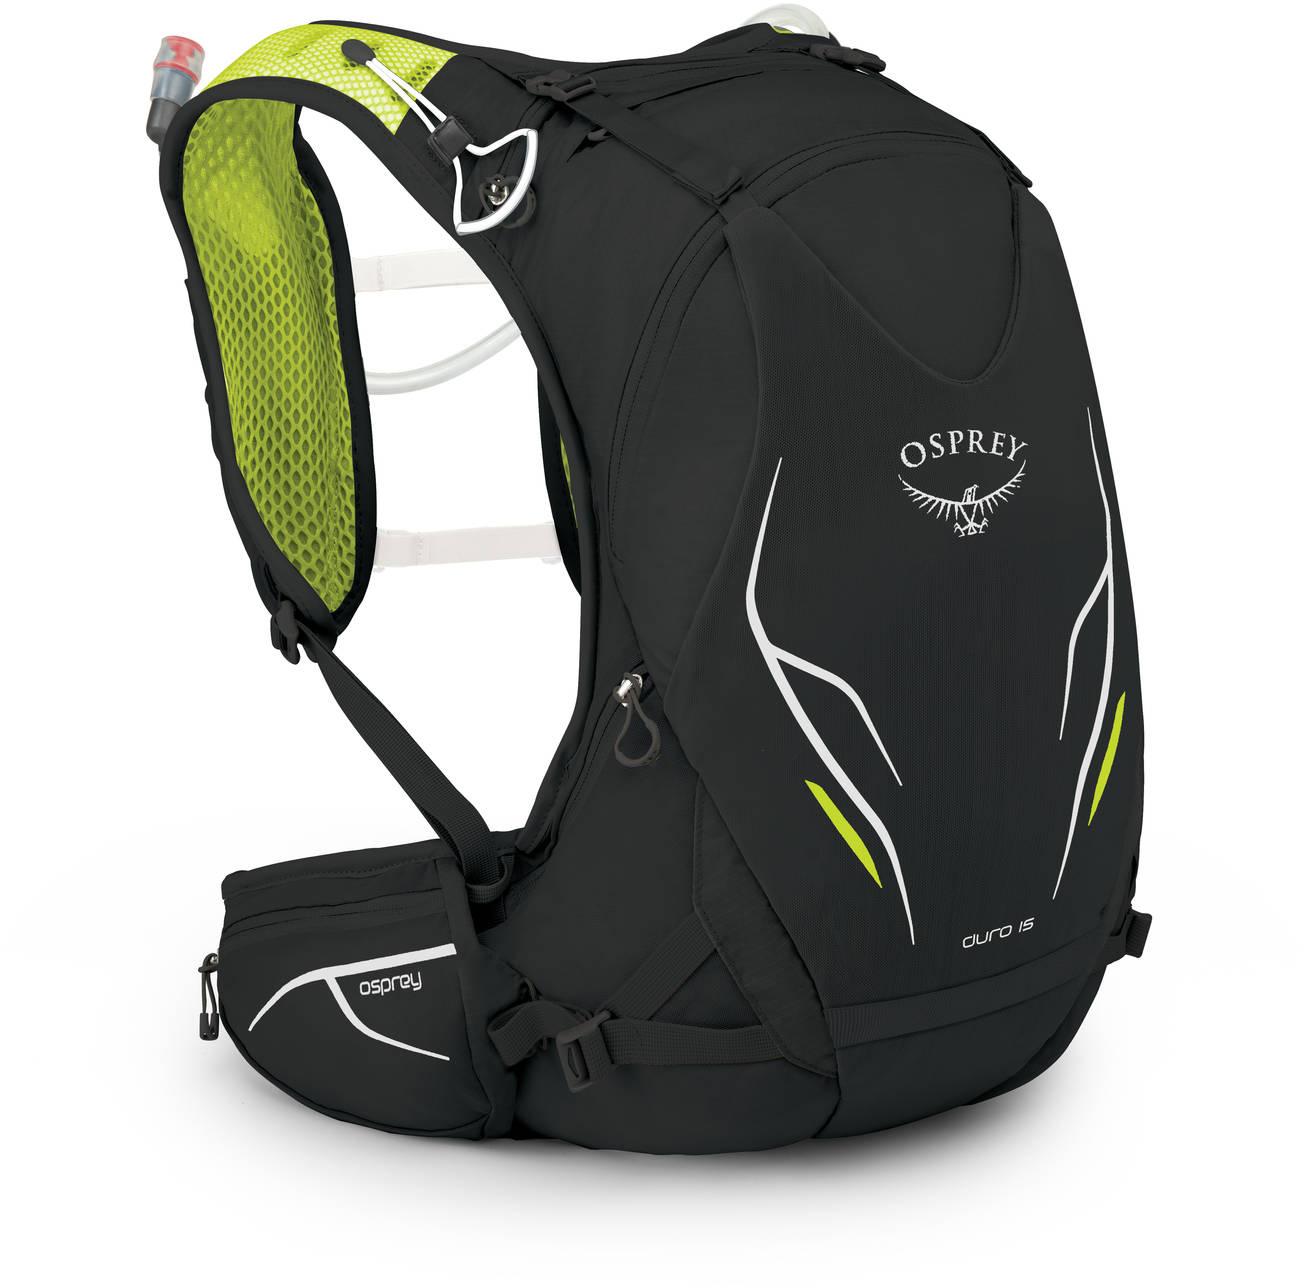 Рюкзаки для бега Рюкзак для бега Osprey Duro 15 Duro_15_S17_Side_Electric_Black_web.jpg